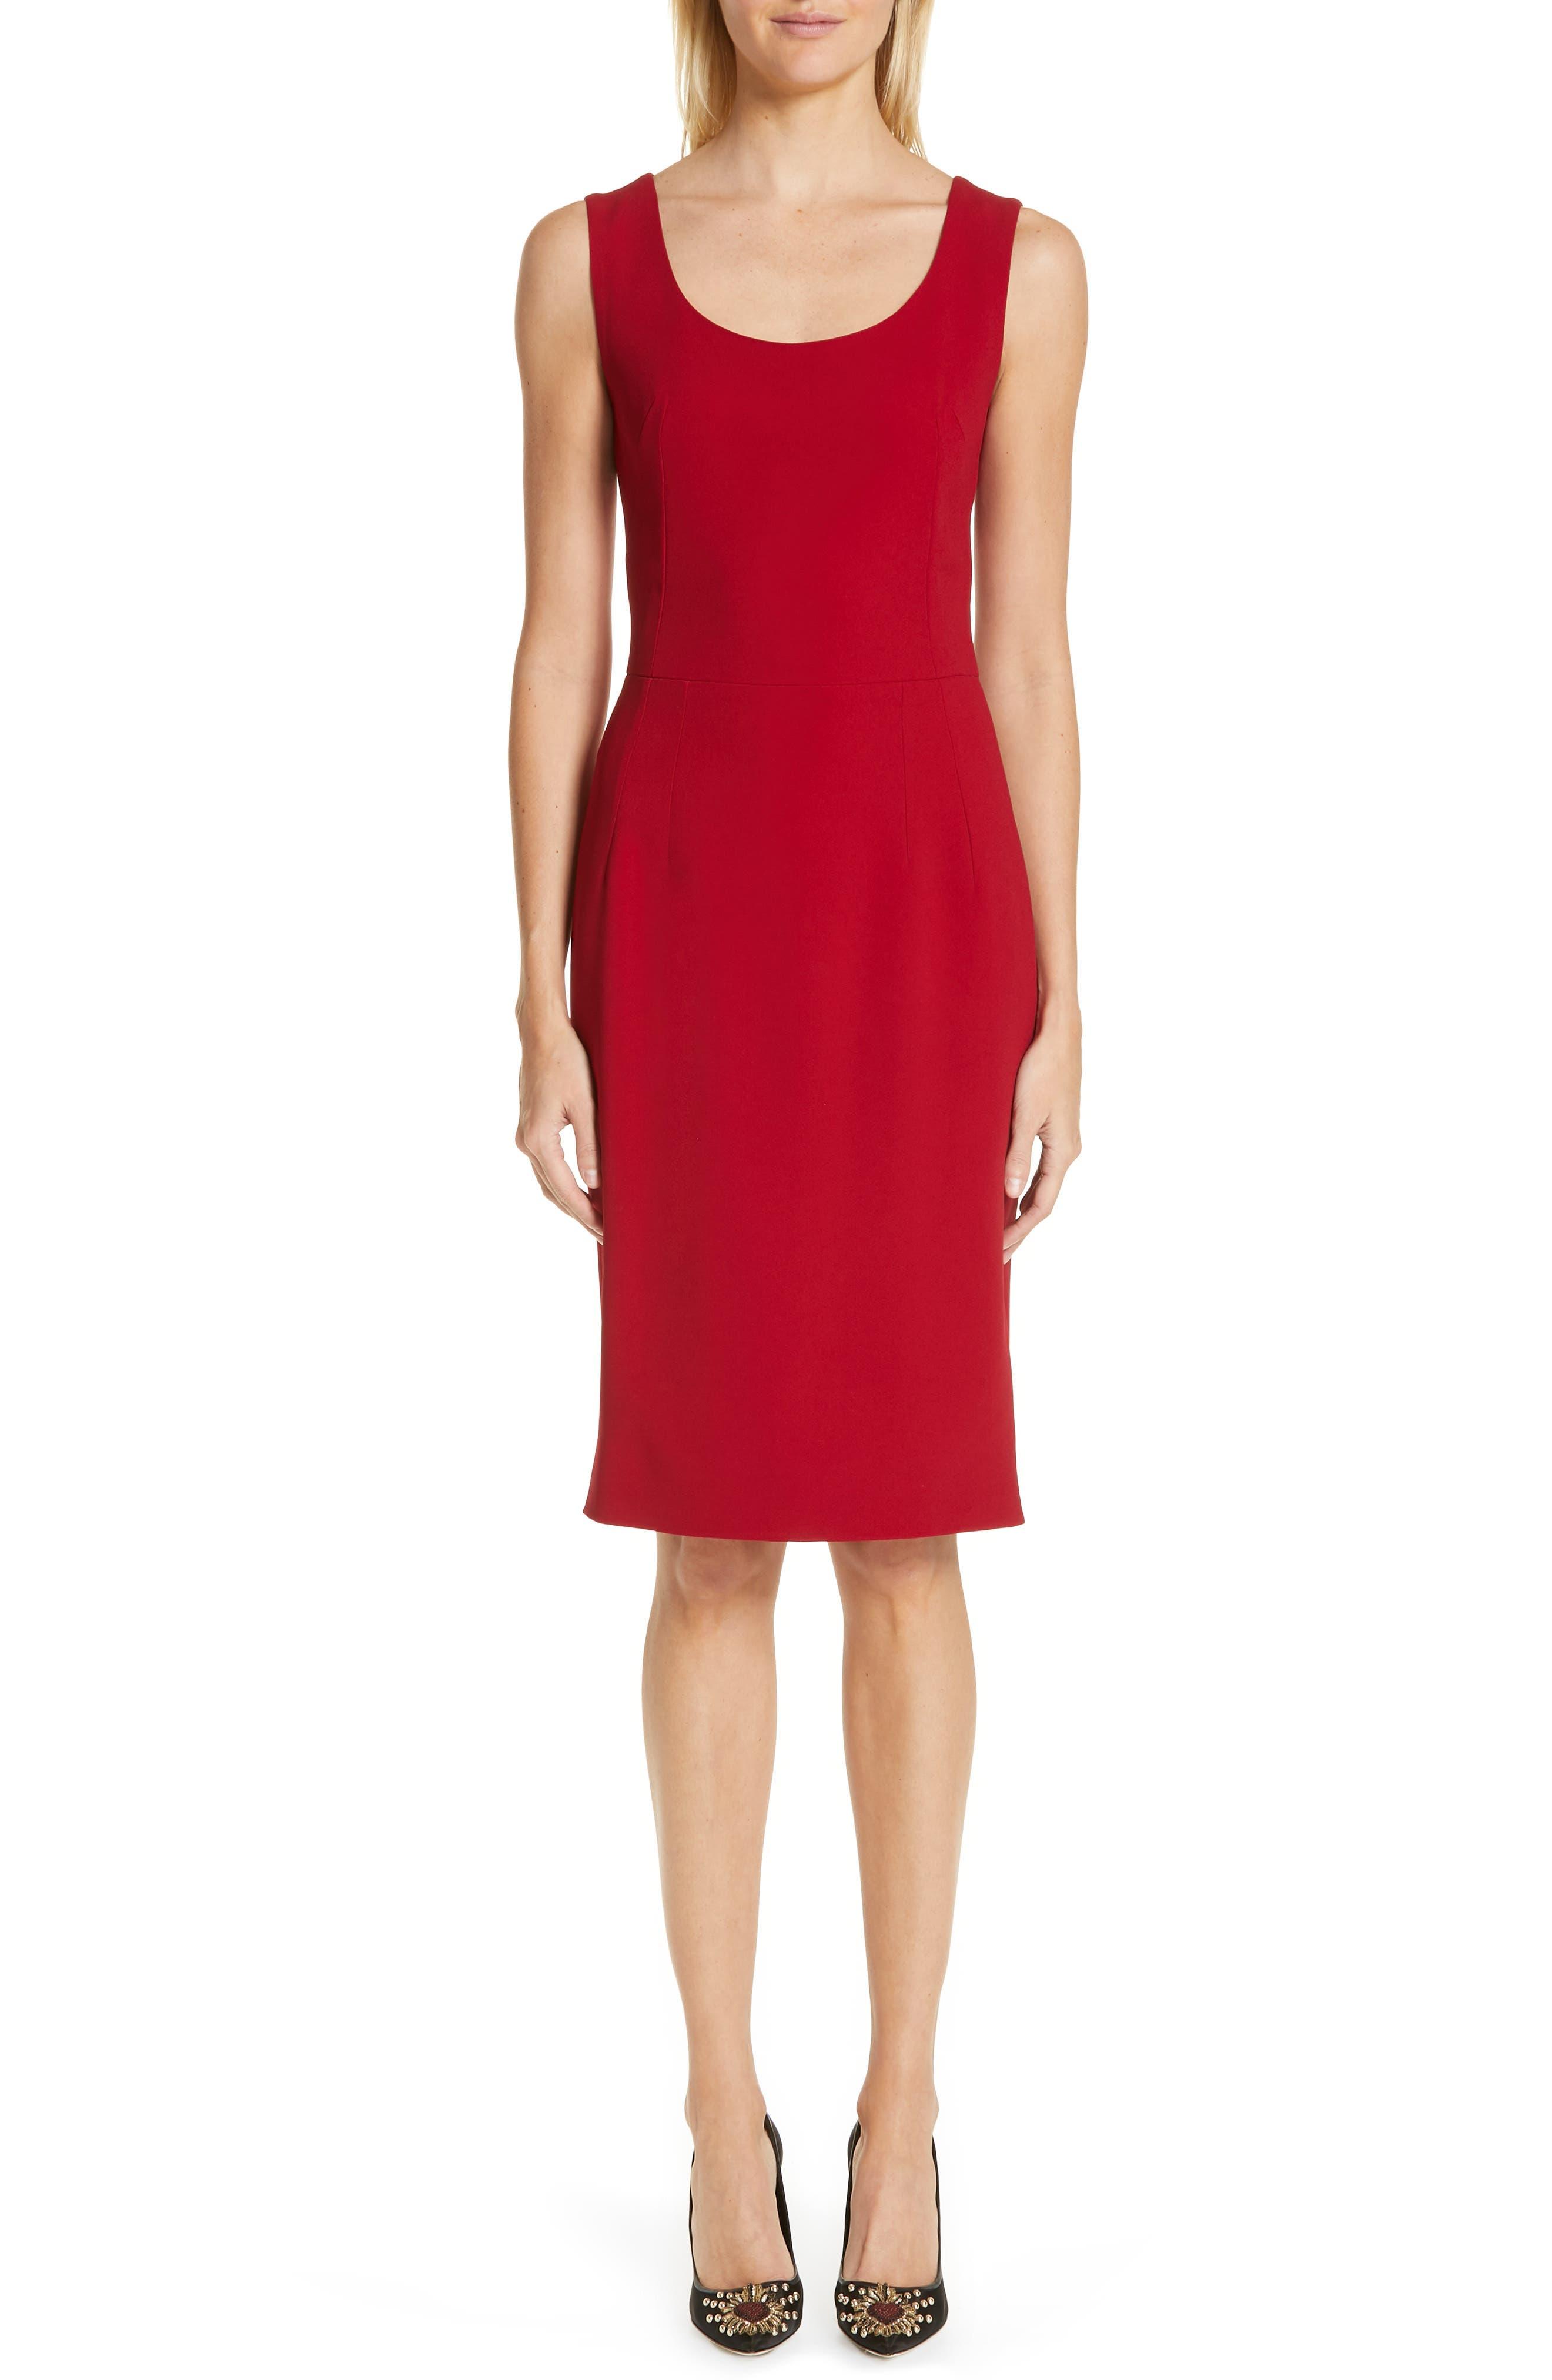 Dolce & gabbana Cady Pencil Dress, US / 44 IT - Burgundy